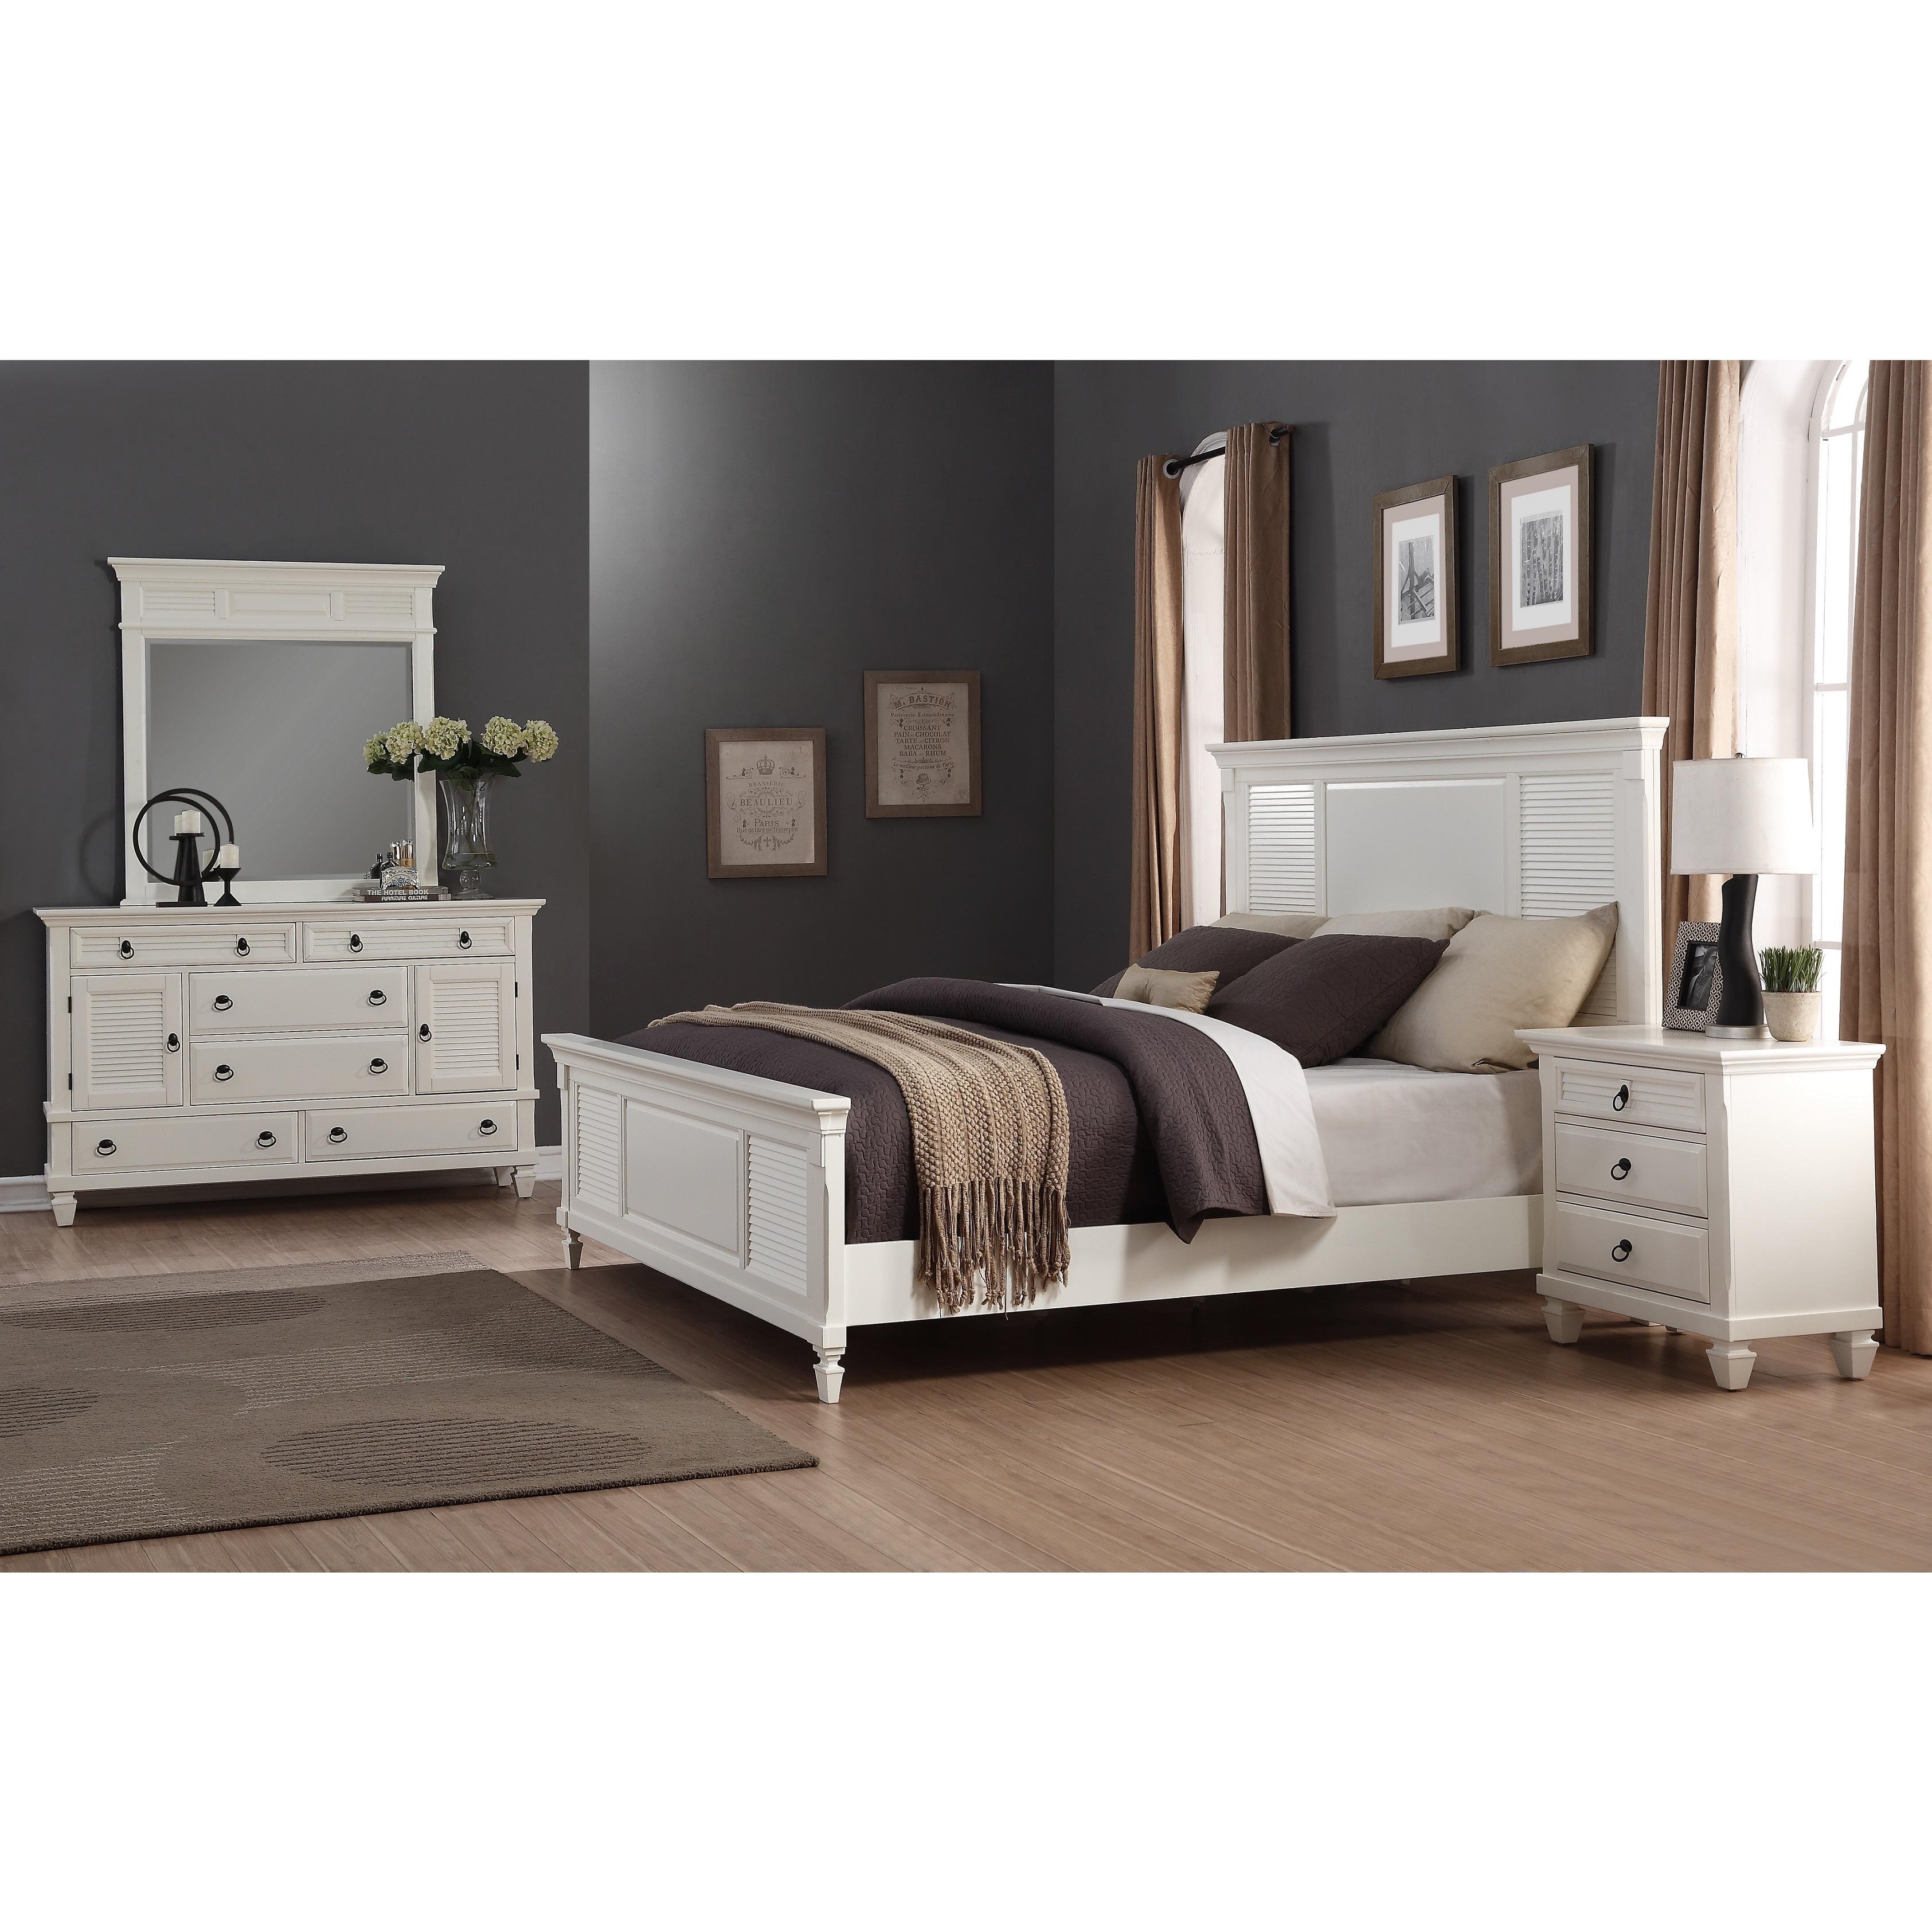 the best attitude da487 c5887 Regitina White 4-Piece King-size Bedroom Furniture Set